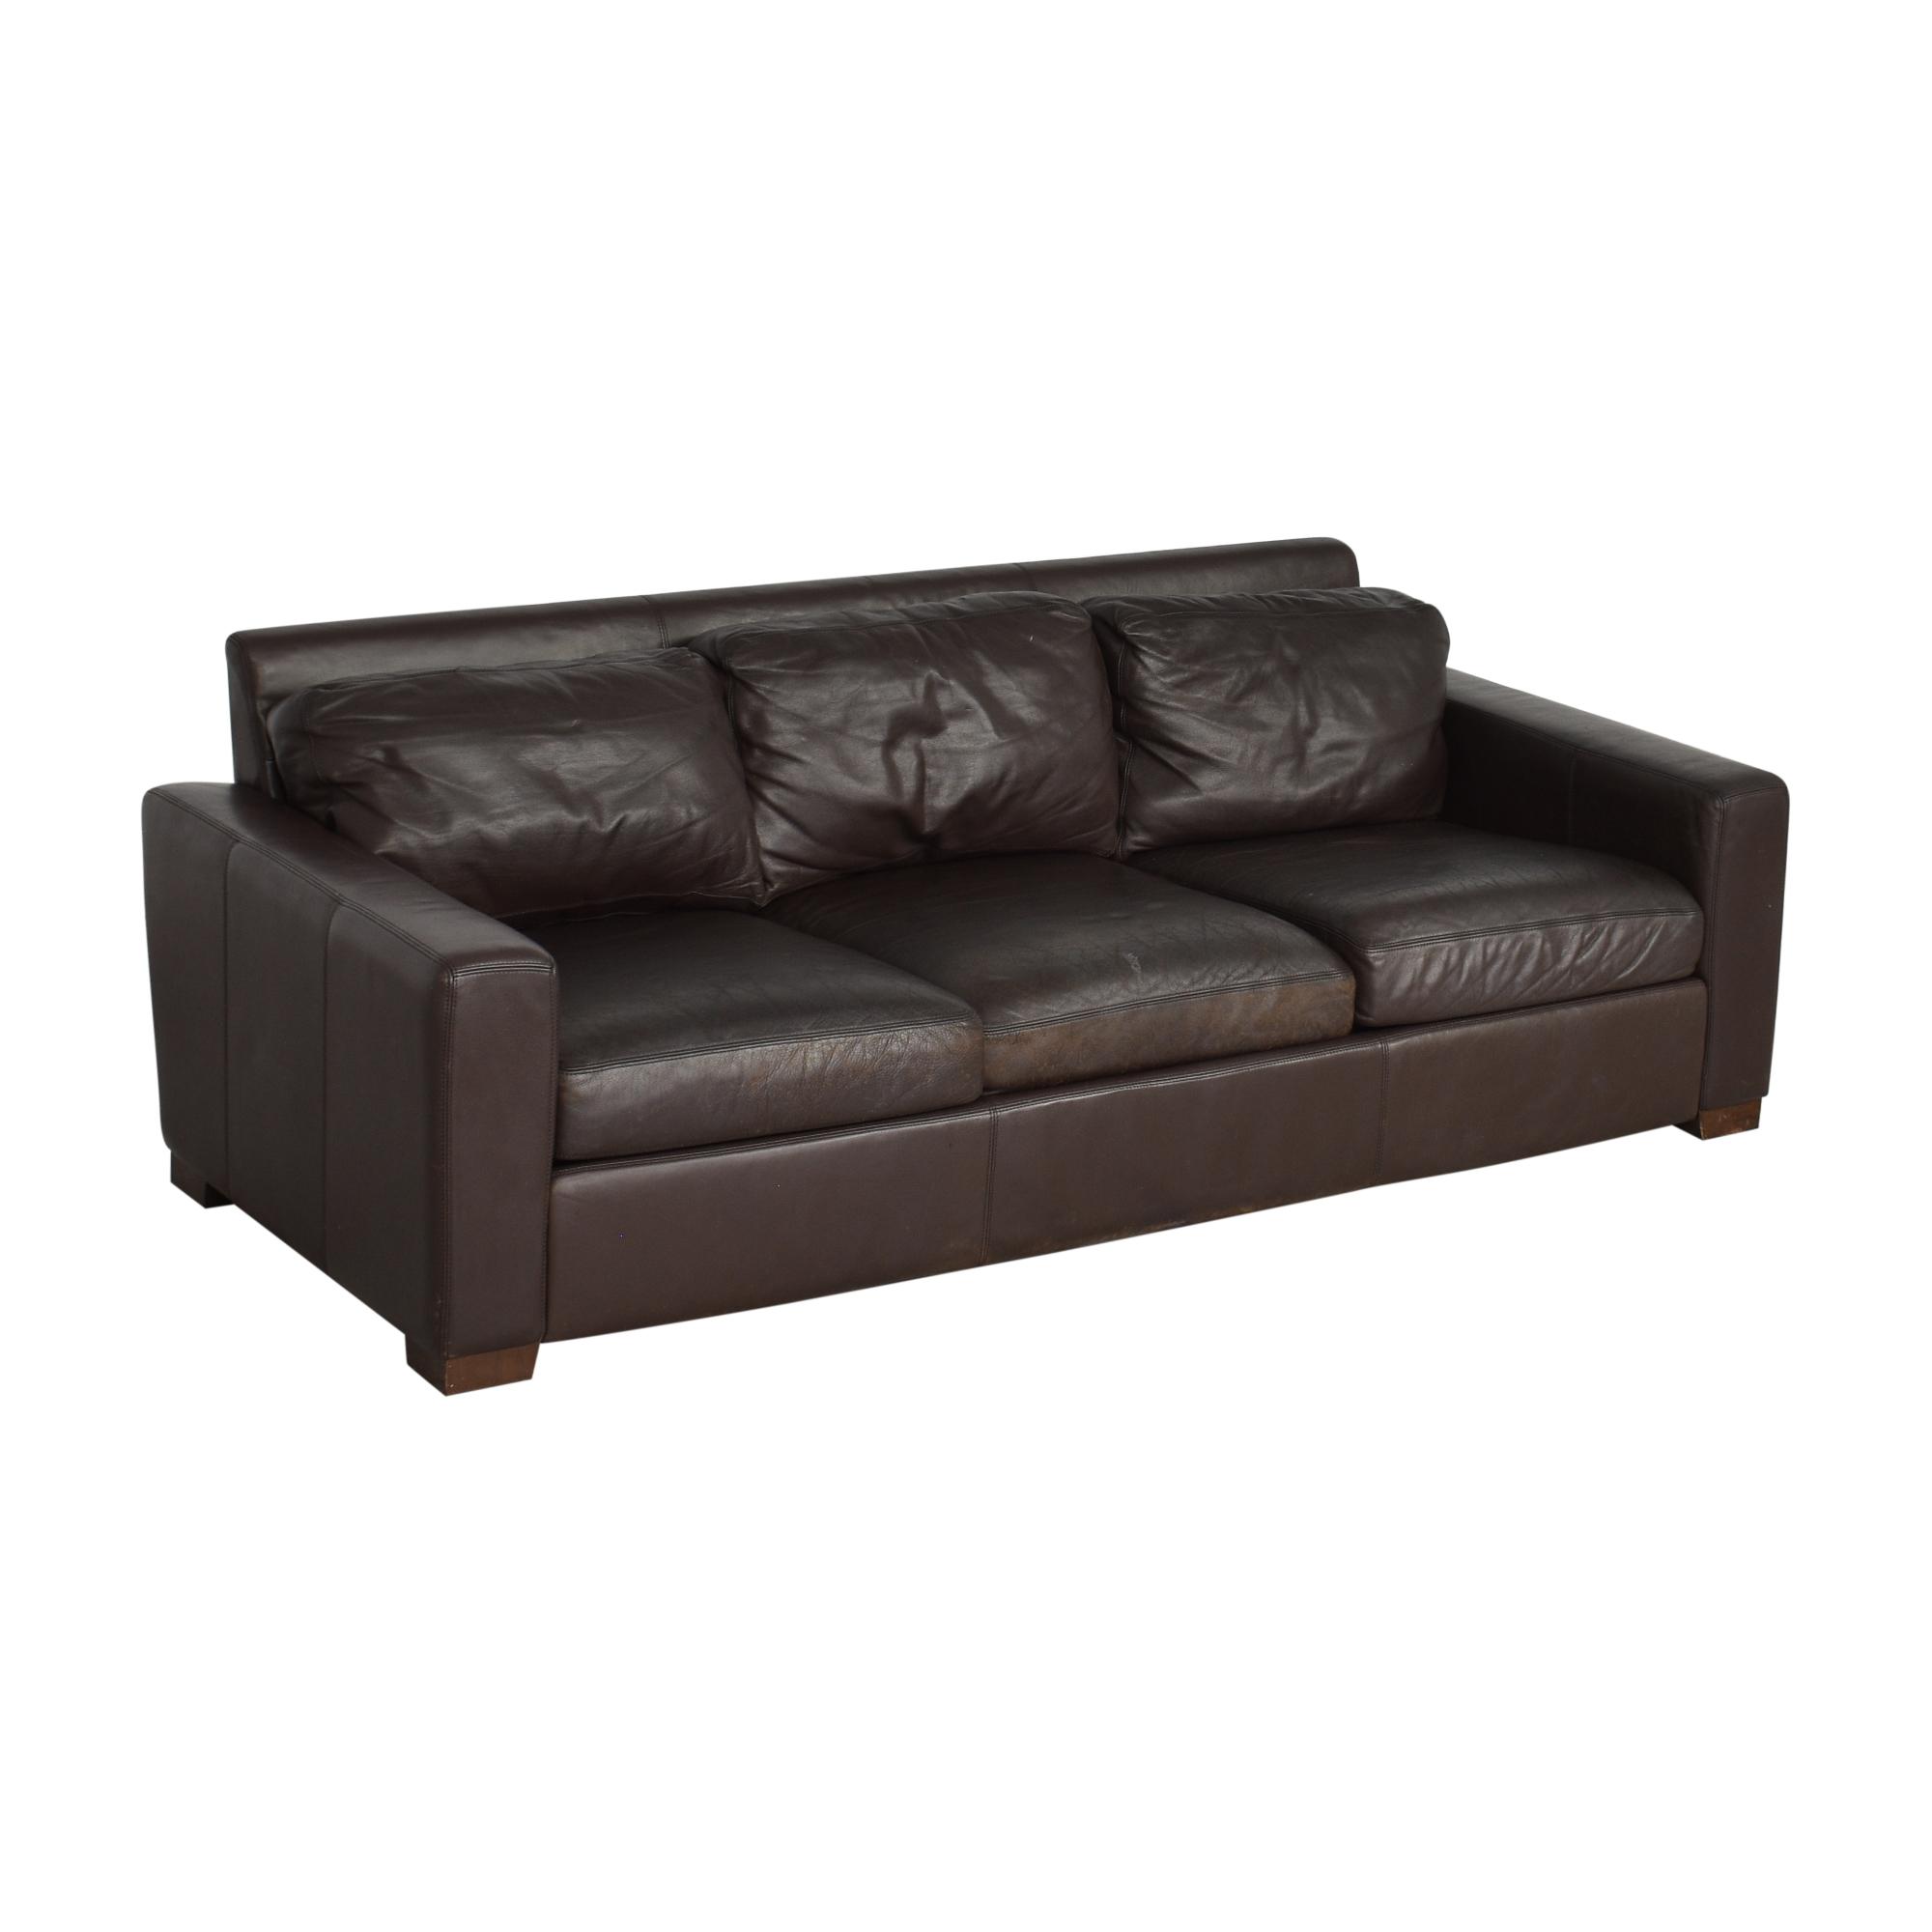 shop Design Within Reach Portola Three Cushion Sofa Design Within Reach Sofas